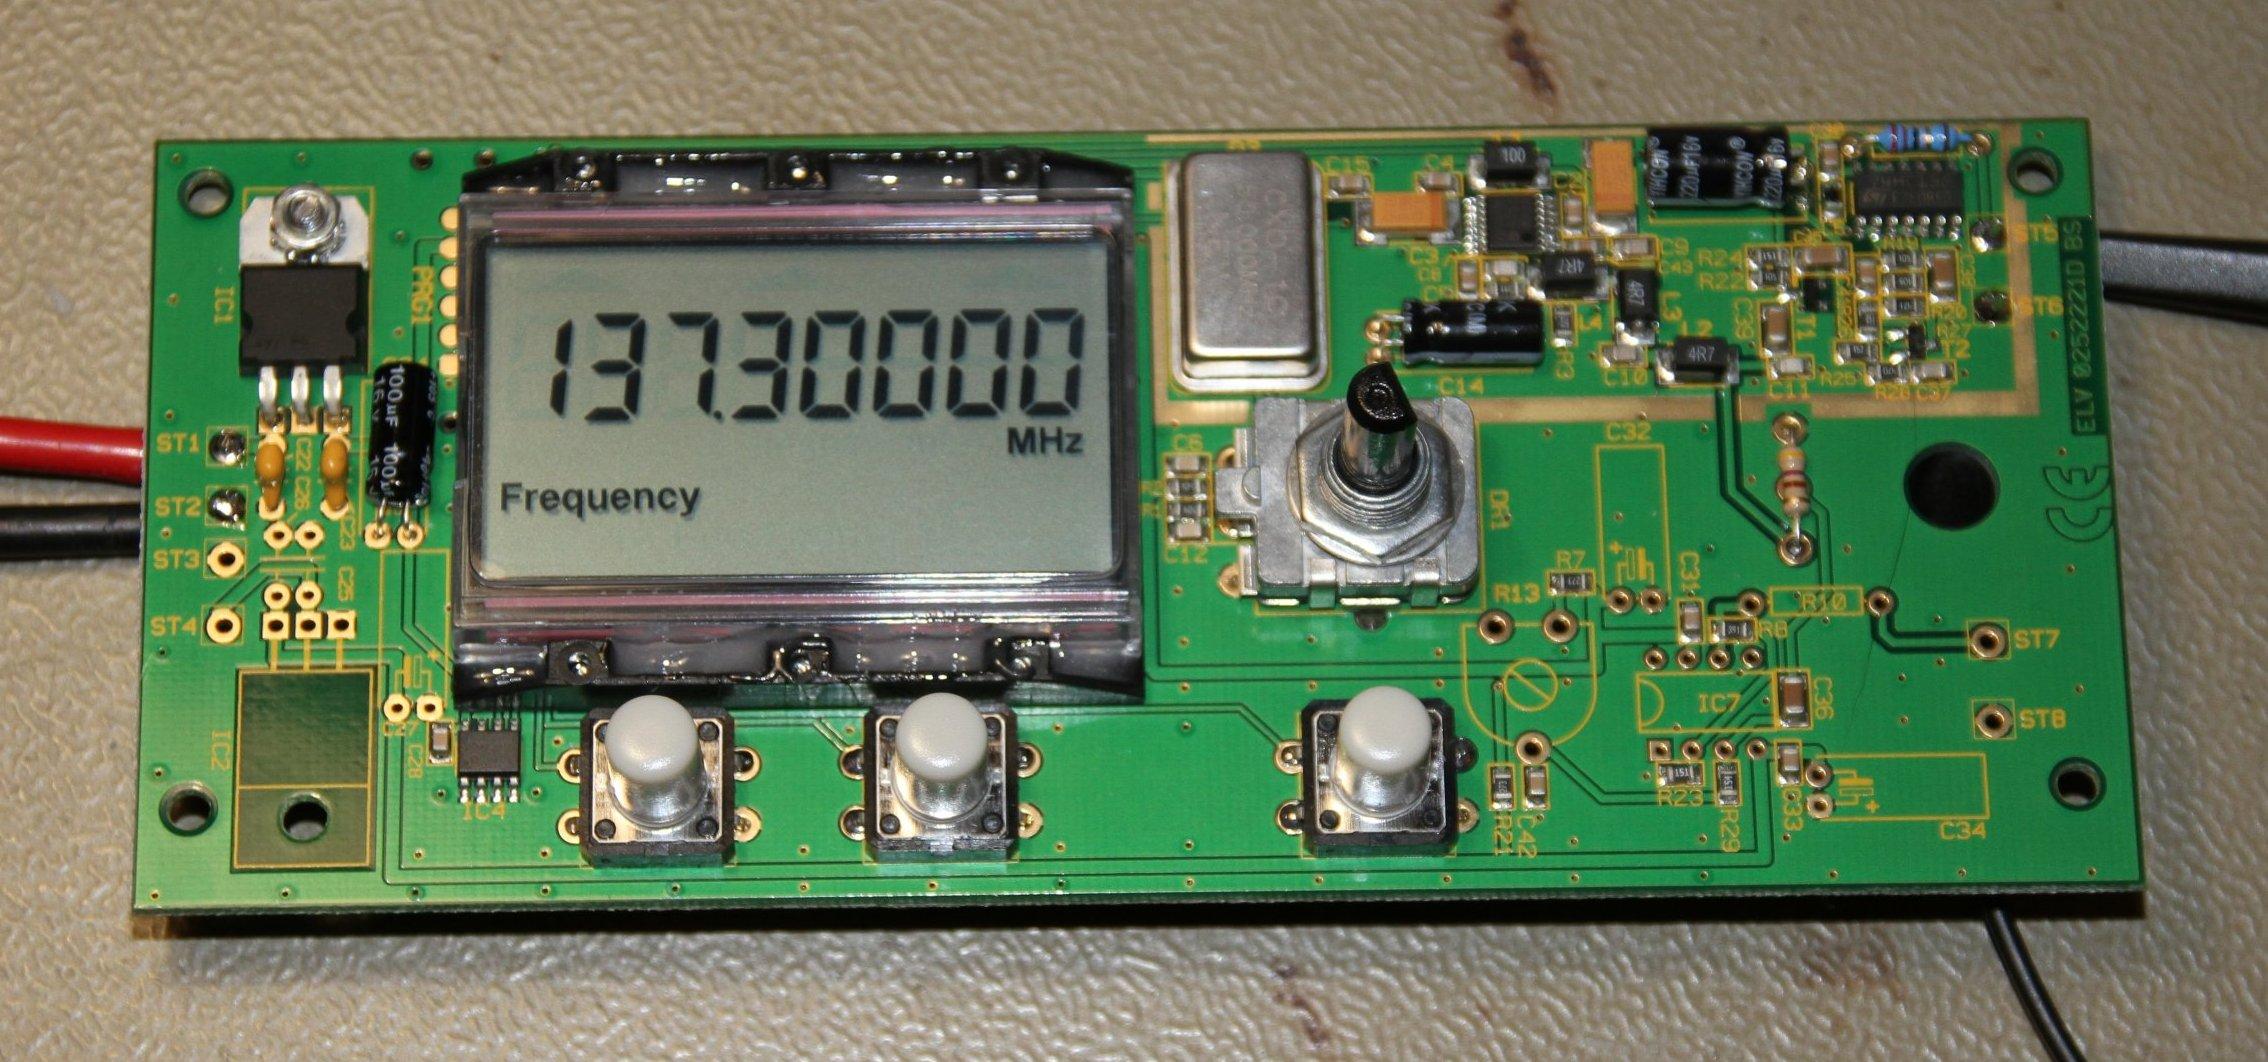 A long-waves and medium-waves dual-band kilowatt CW transmitter